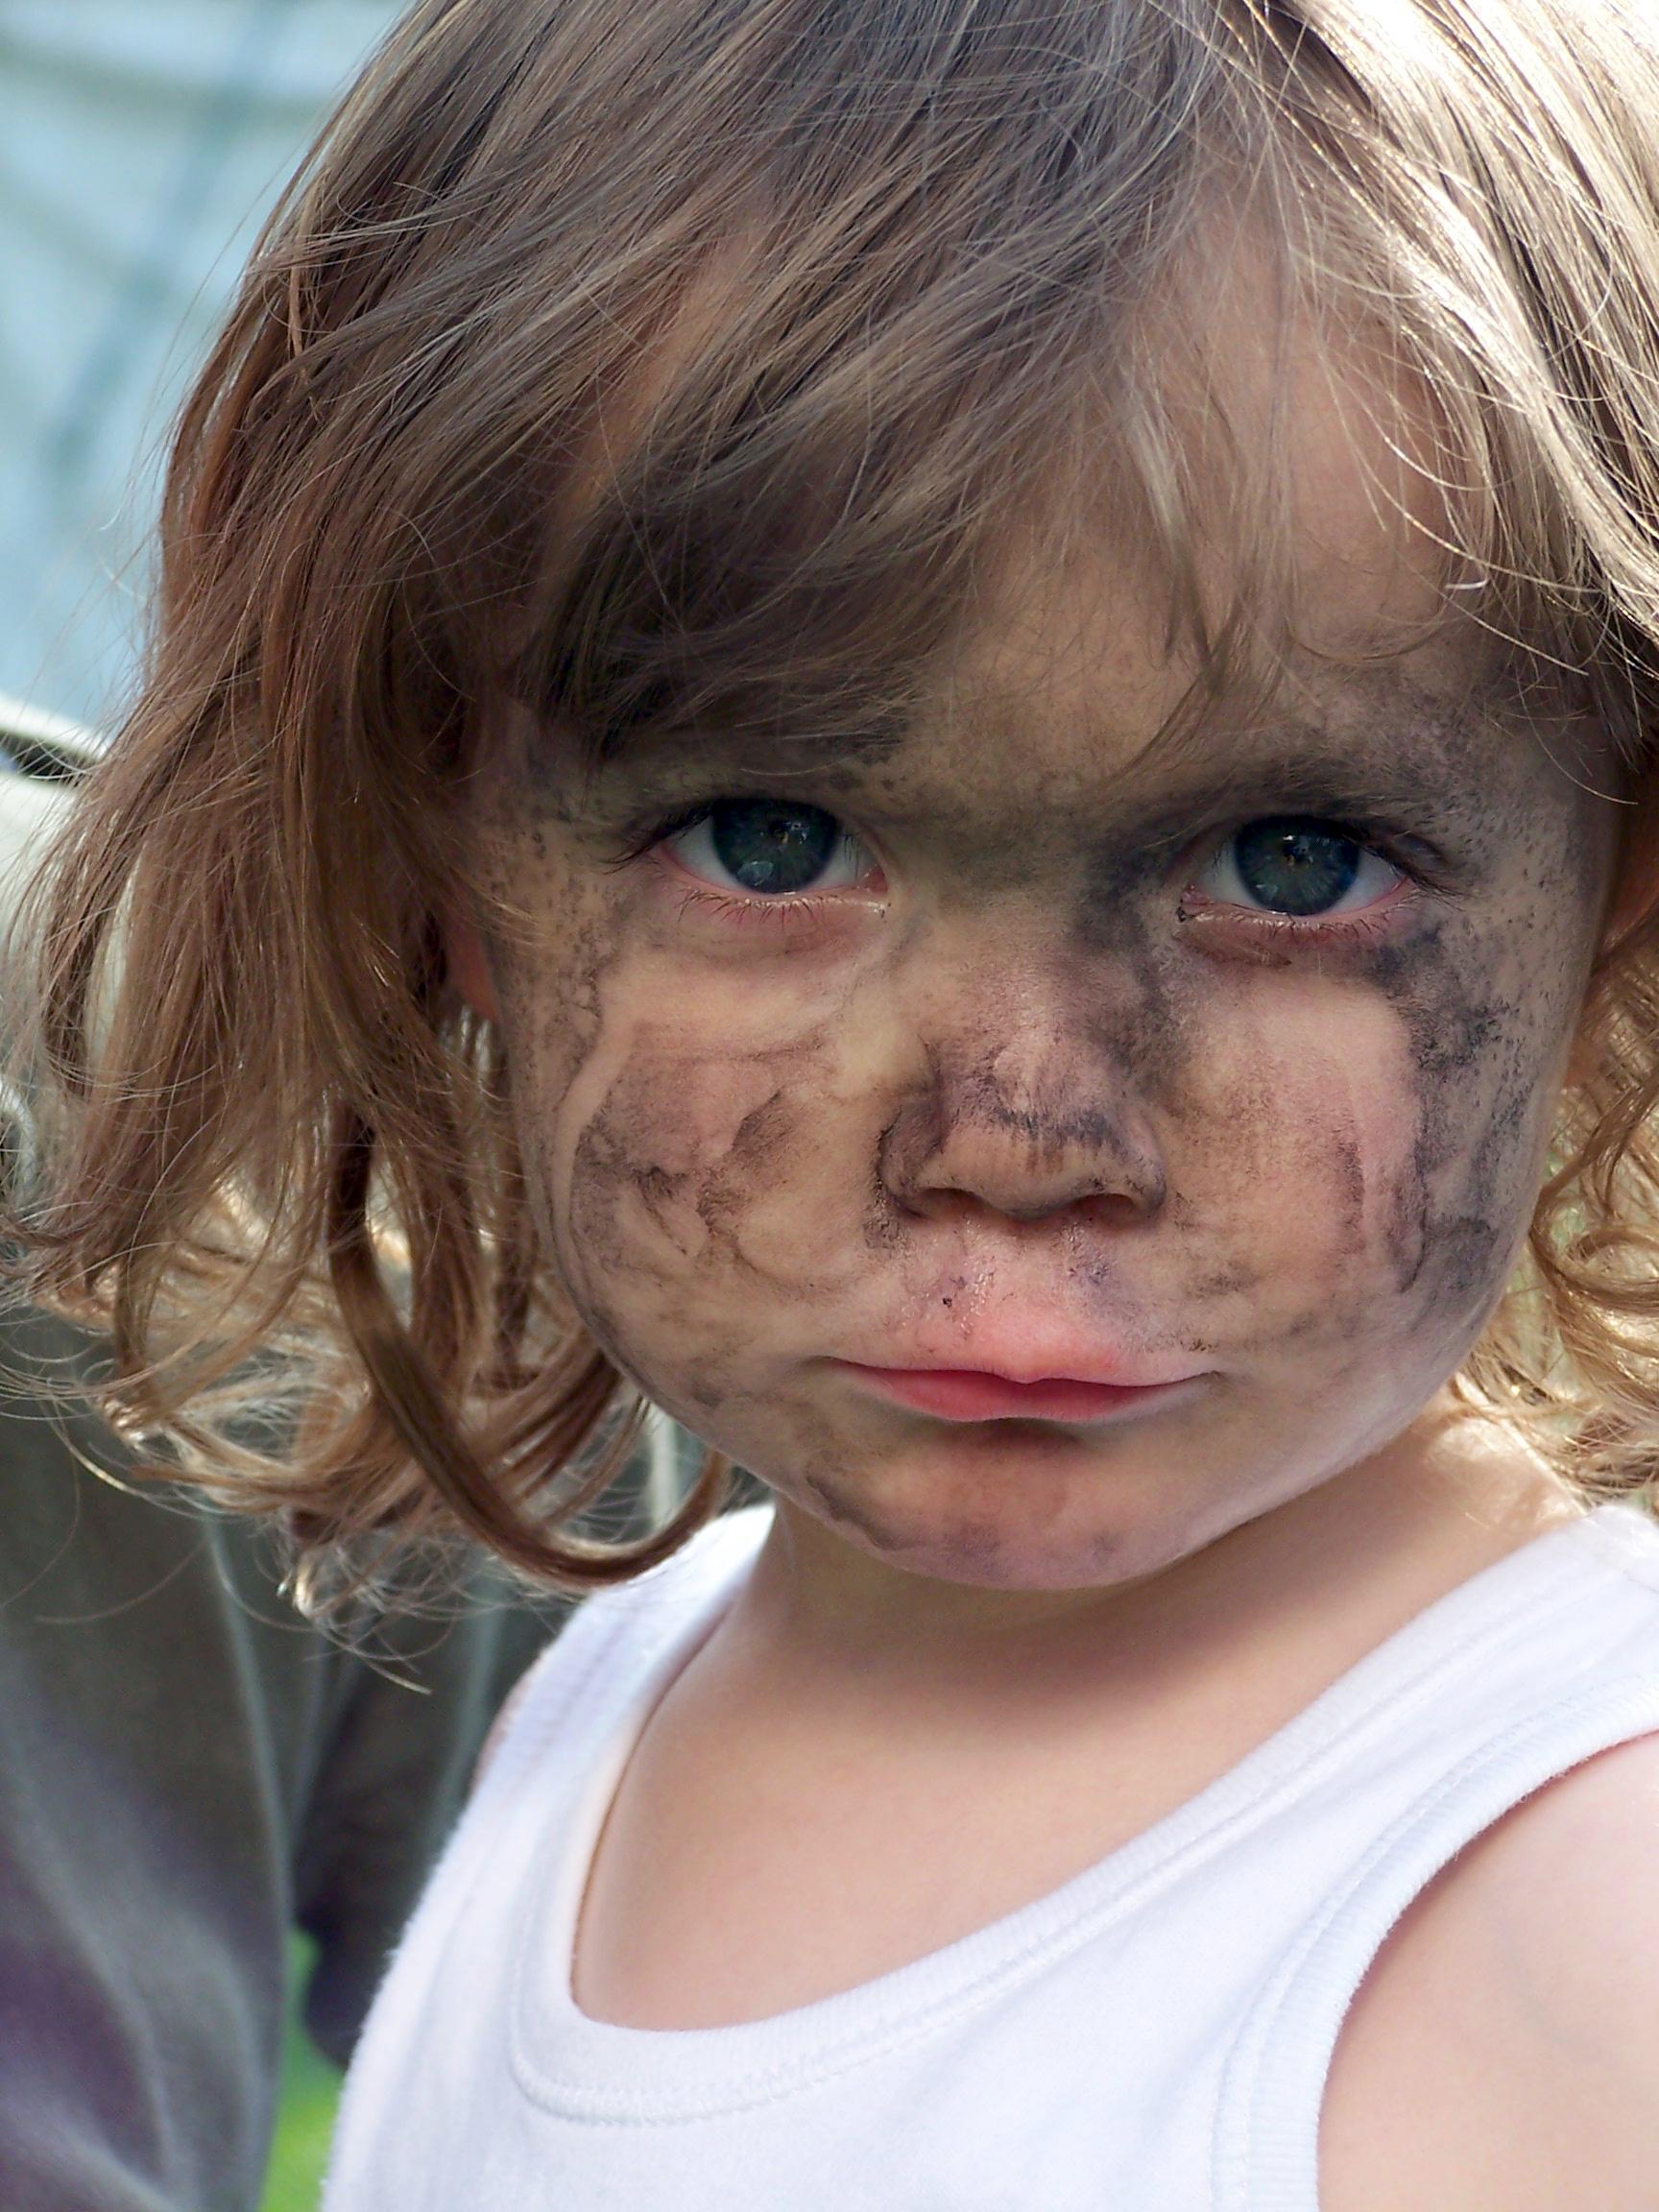 Waschtipps Hartnackige Flecken Aus Kinderkleidung Entfernen